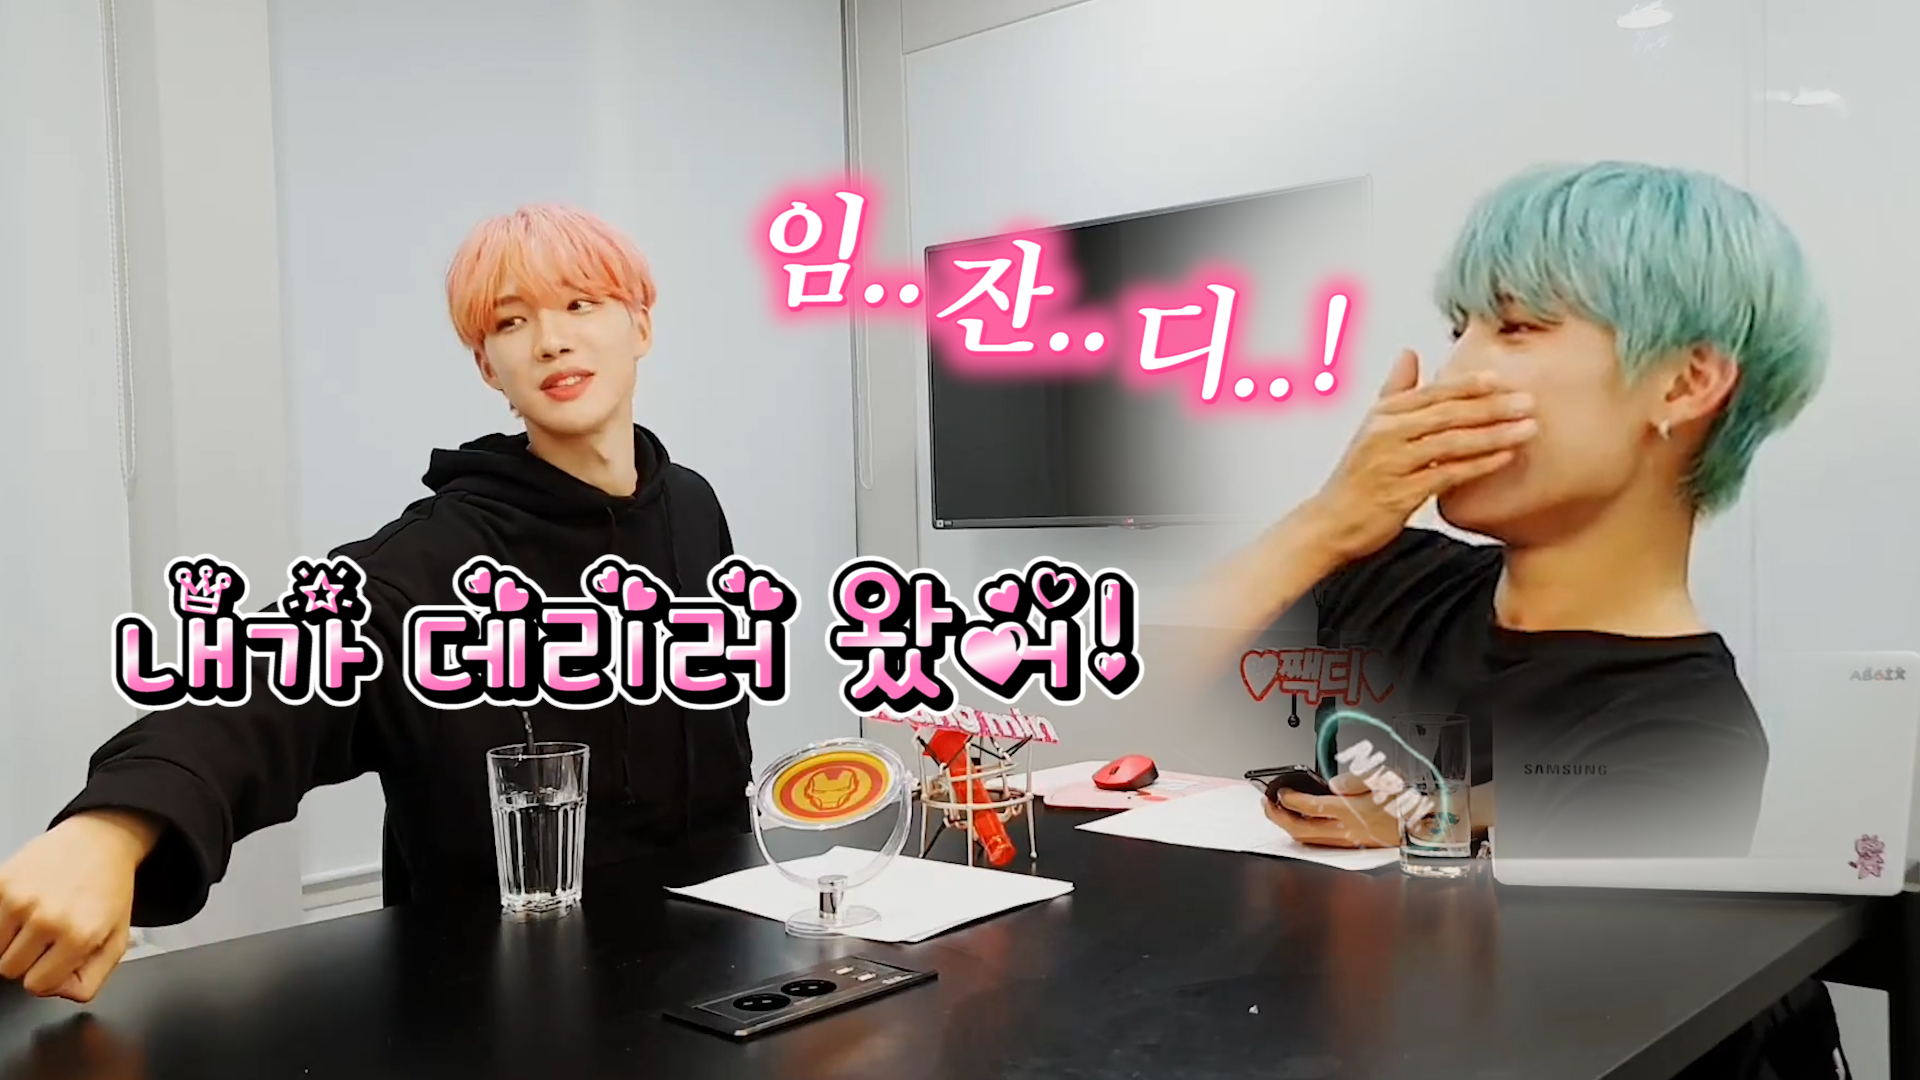 [AB6IX] 명예소방관 합니다 흰 천과 바람 있으신 분 디엠주세요🙋♀️💨 (Woojin's first visual radio with youngmin)